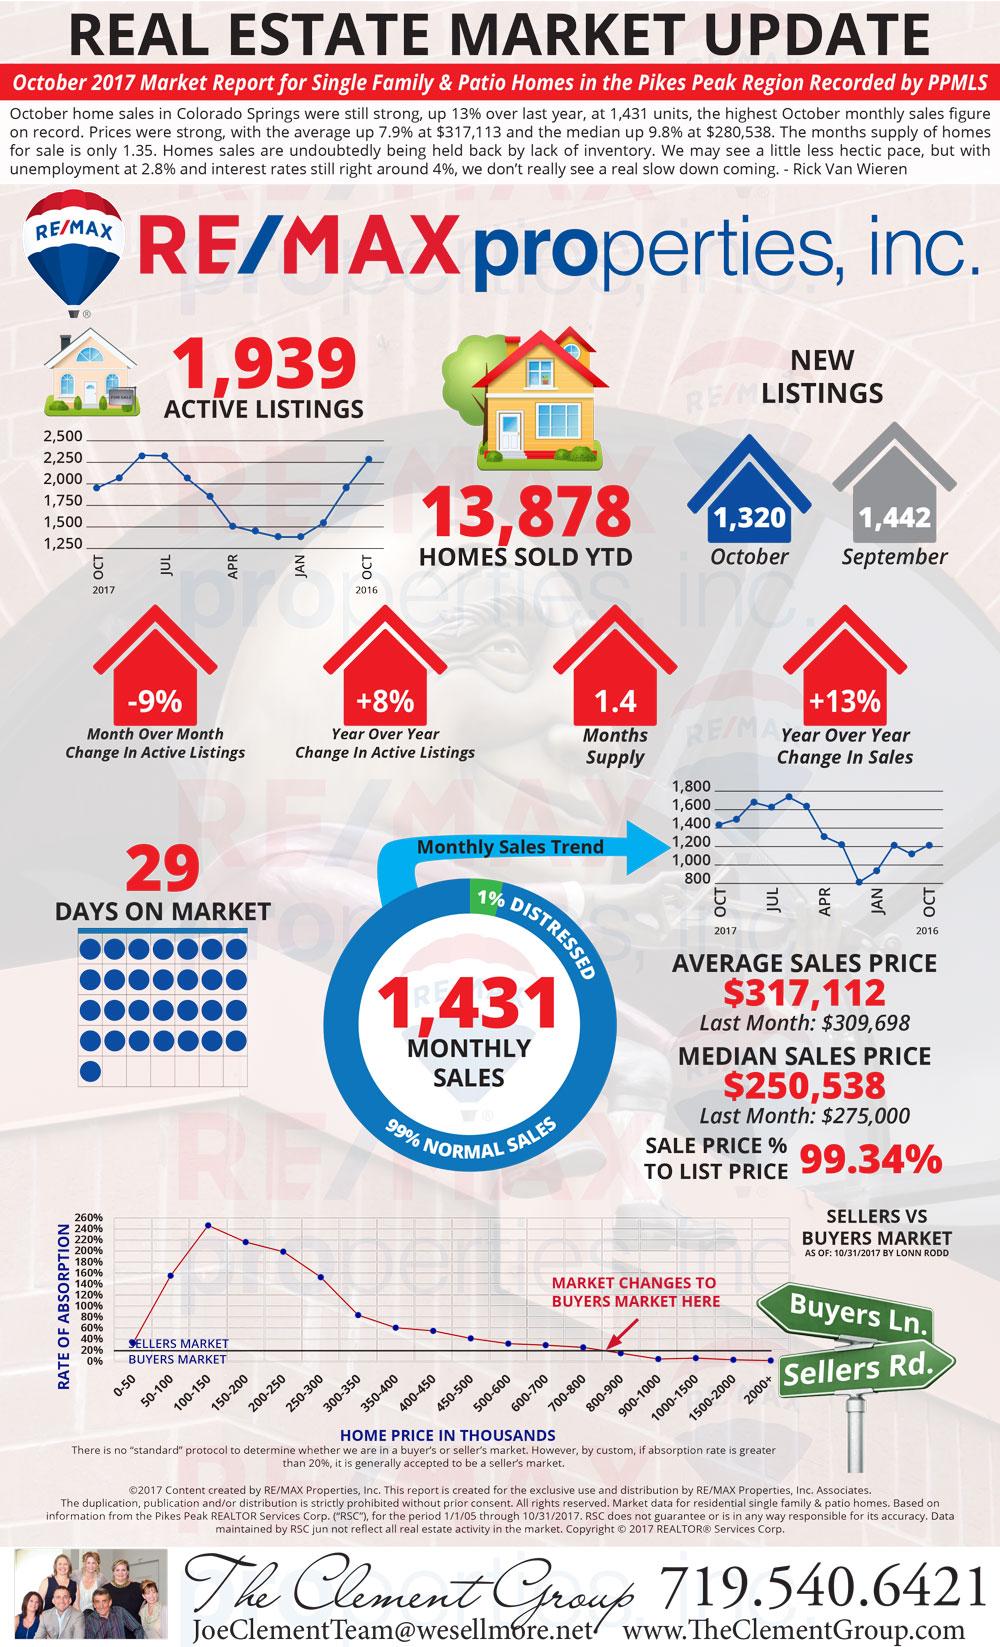 October 2017 Market Update - Colorado Springs Real Estate